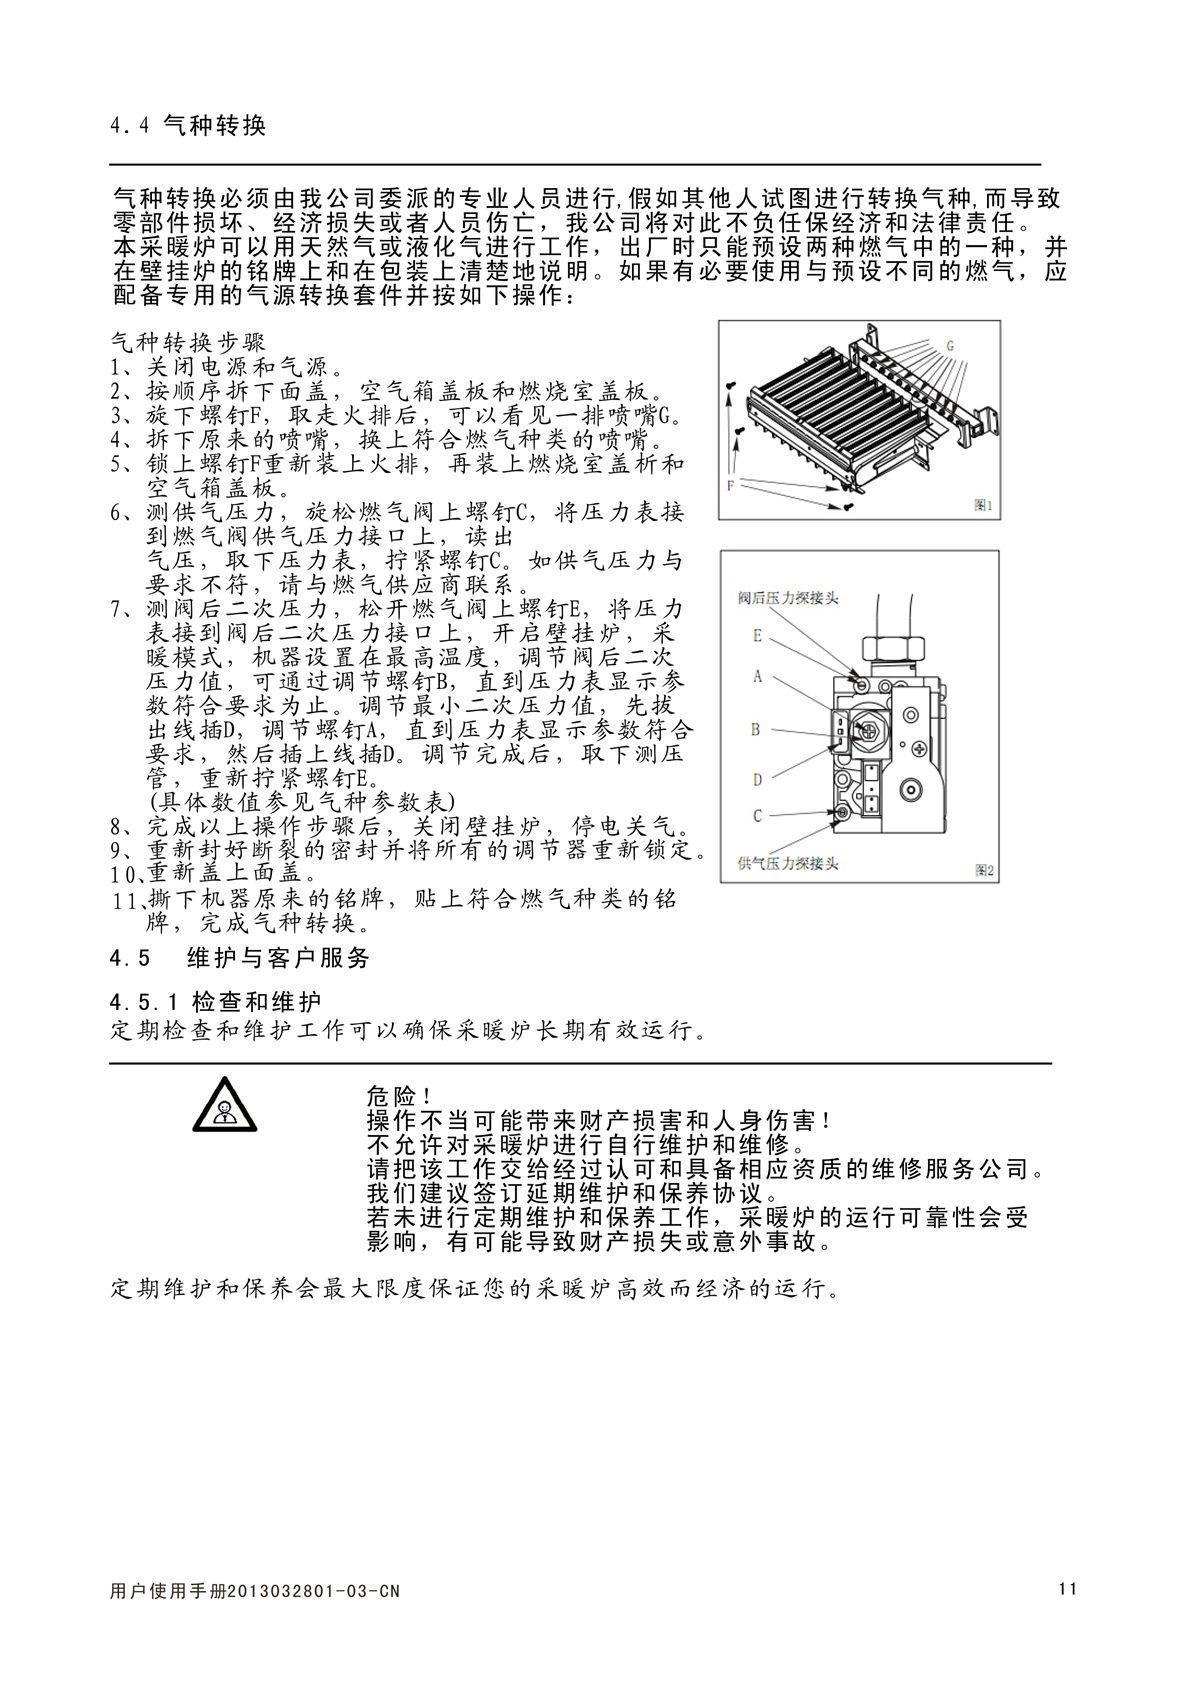 ES03系列-用户使用手册-7_02.jpg